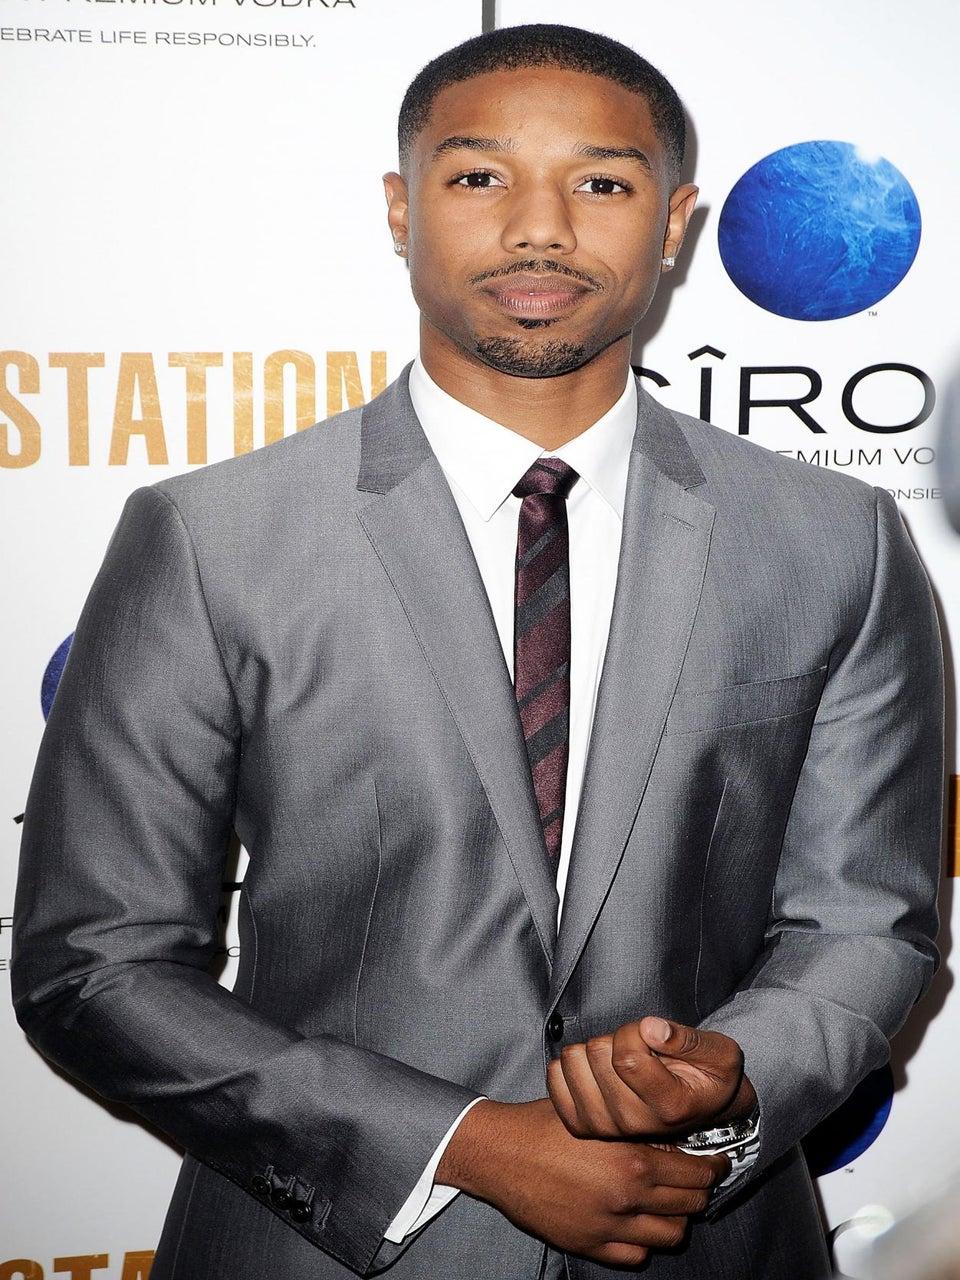 EXCLUSIVE: Michael B. Jordan Talks 'Fruitvale Station,' Portraying Oscar Grant